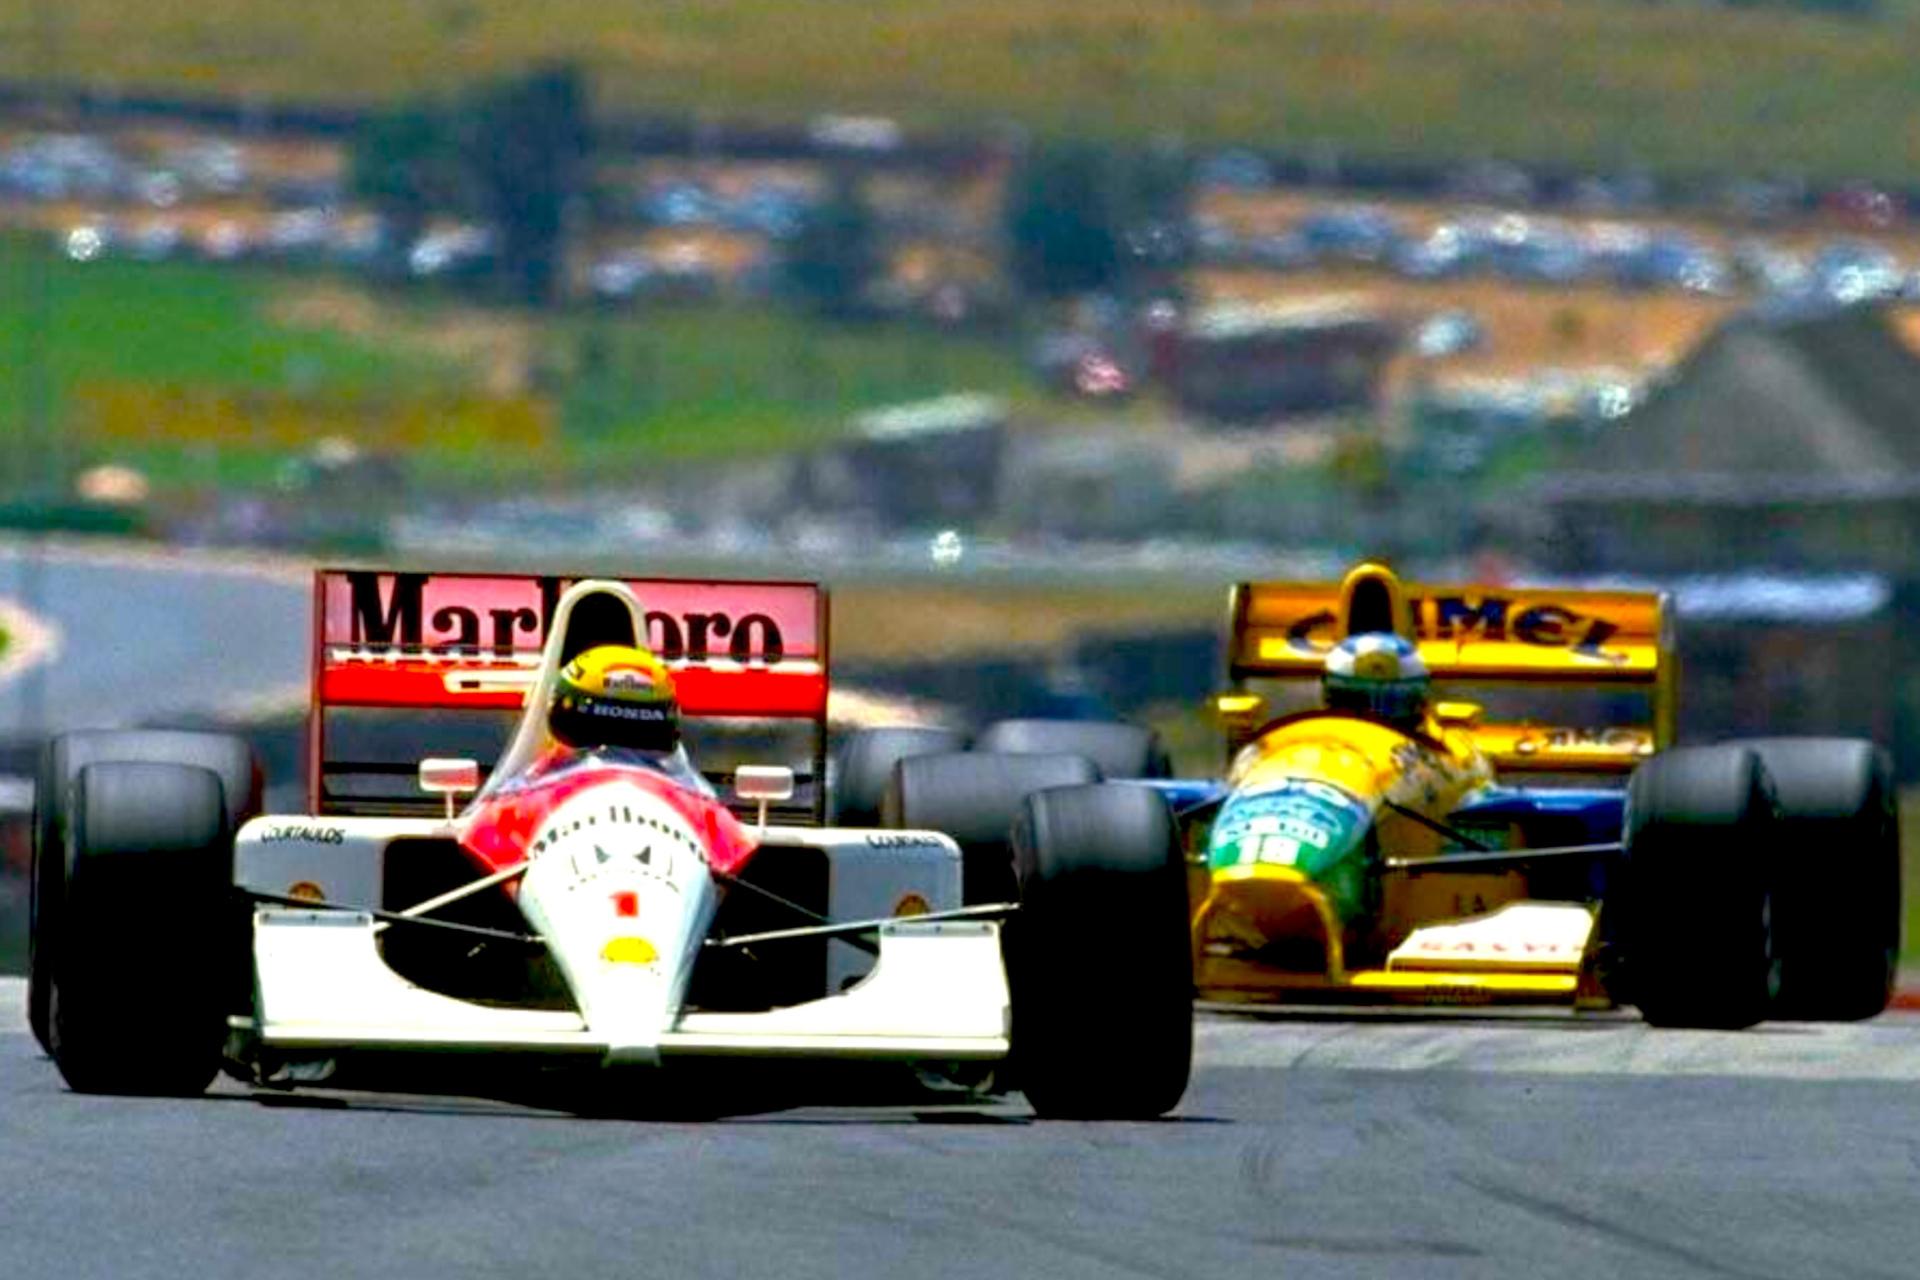 Senna & Schumacher at Kyalami